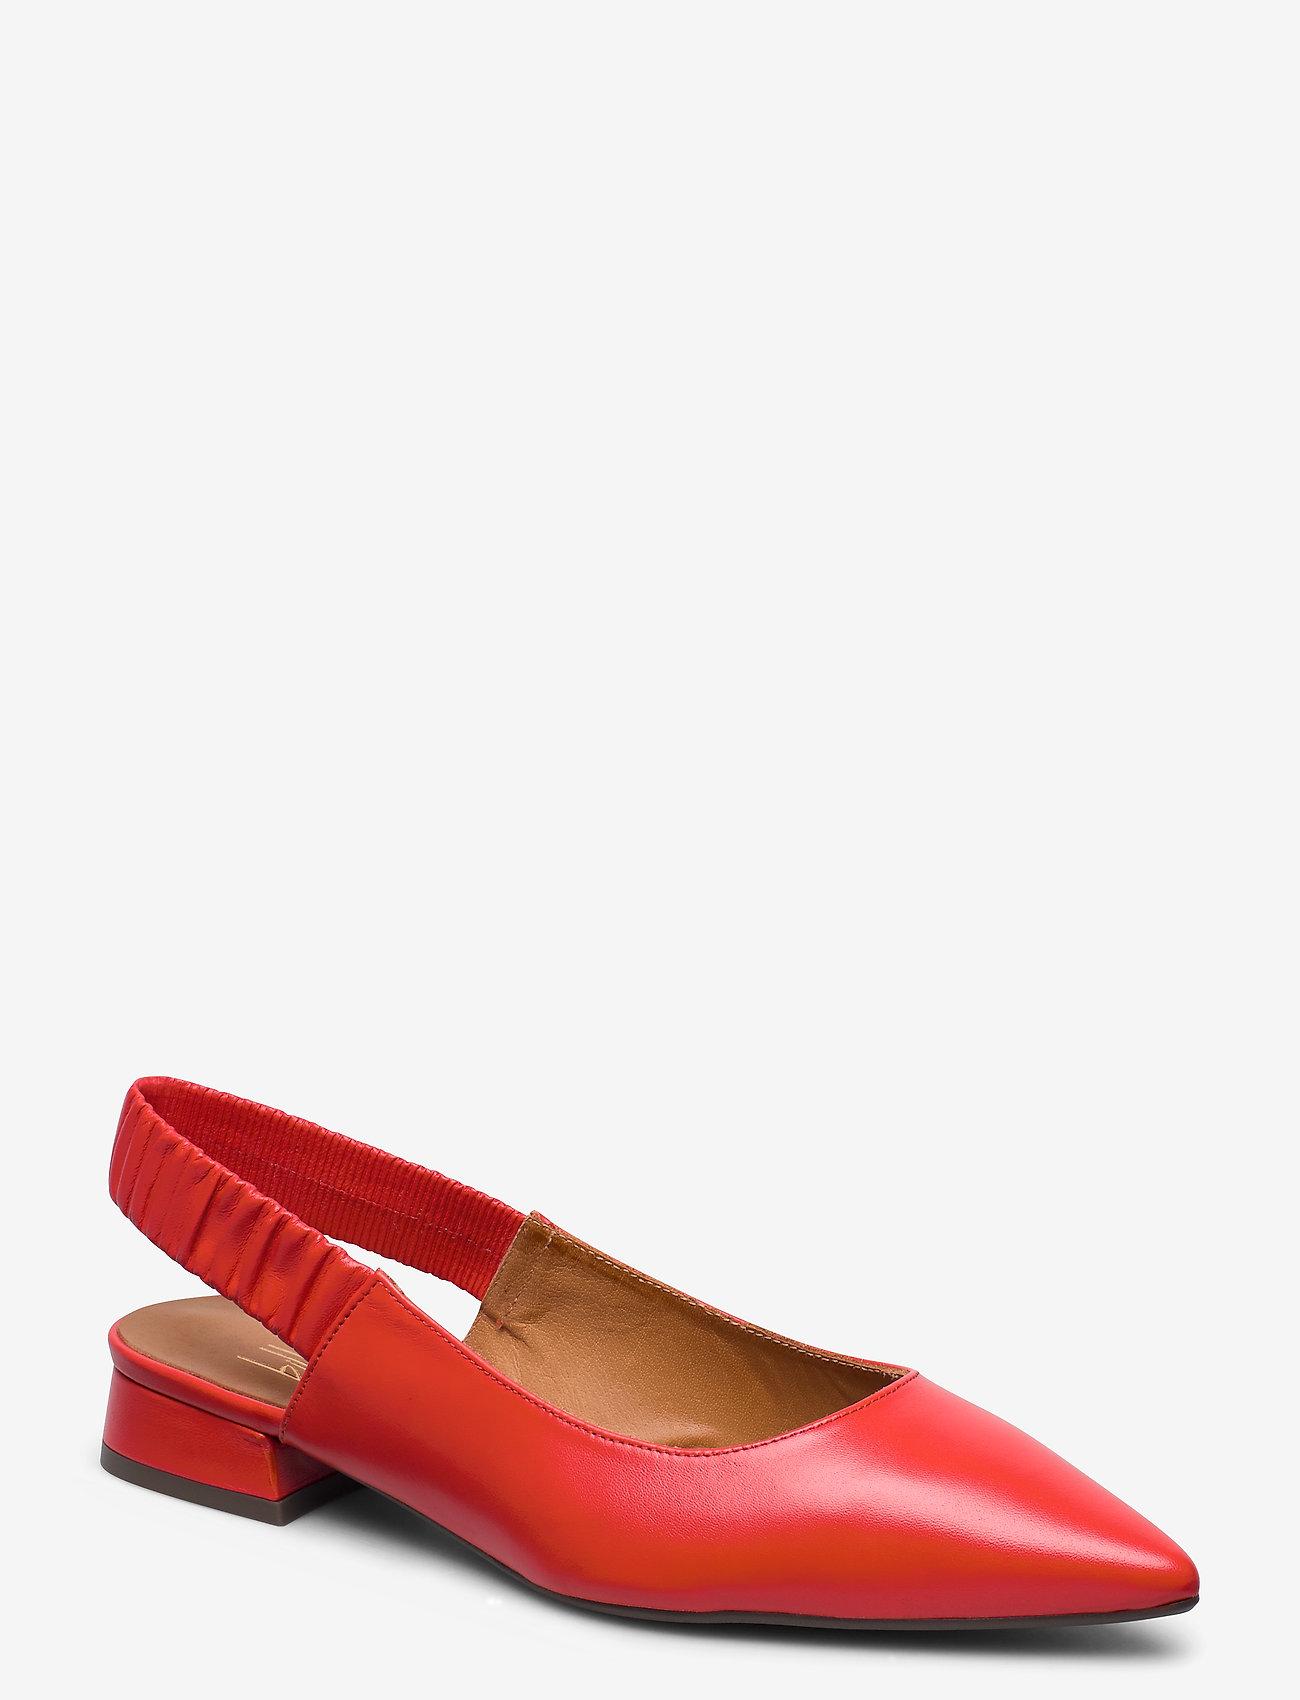 Billi Bi - Shoes 4512 - sling backs - coral 6256 nappa 77 - 0